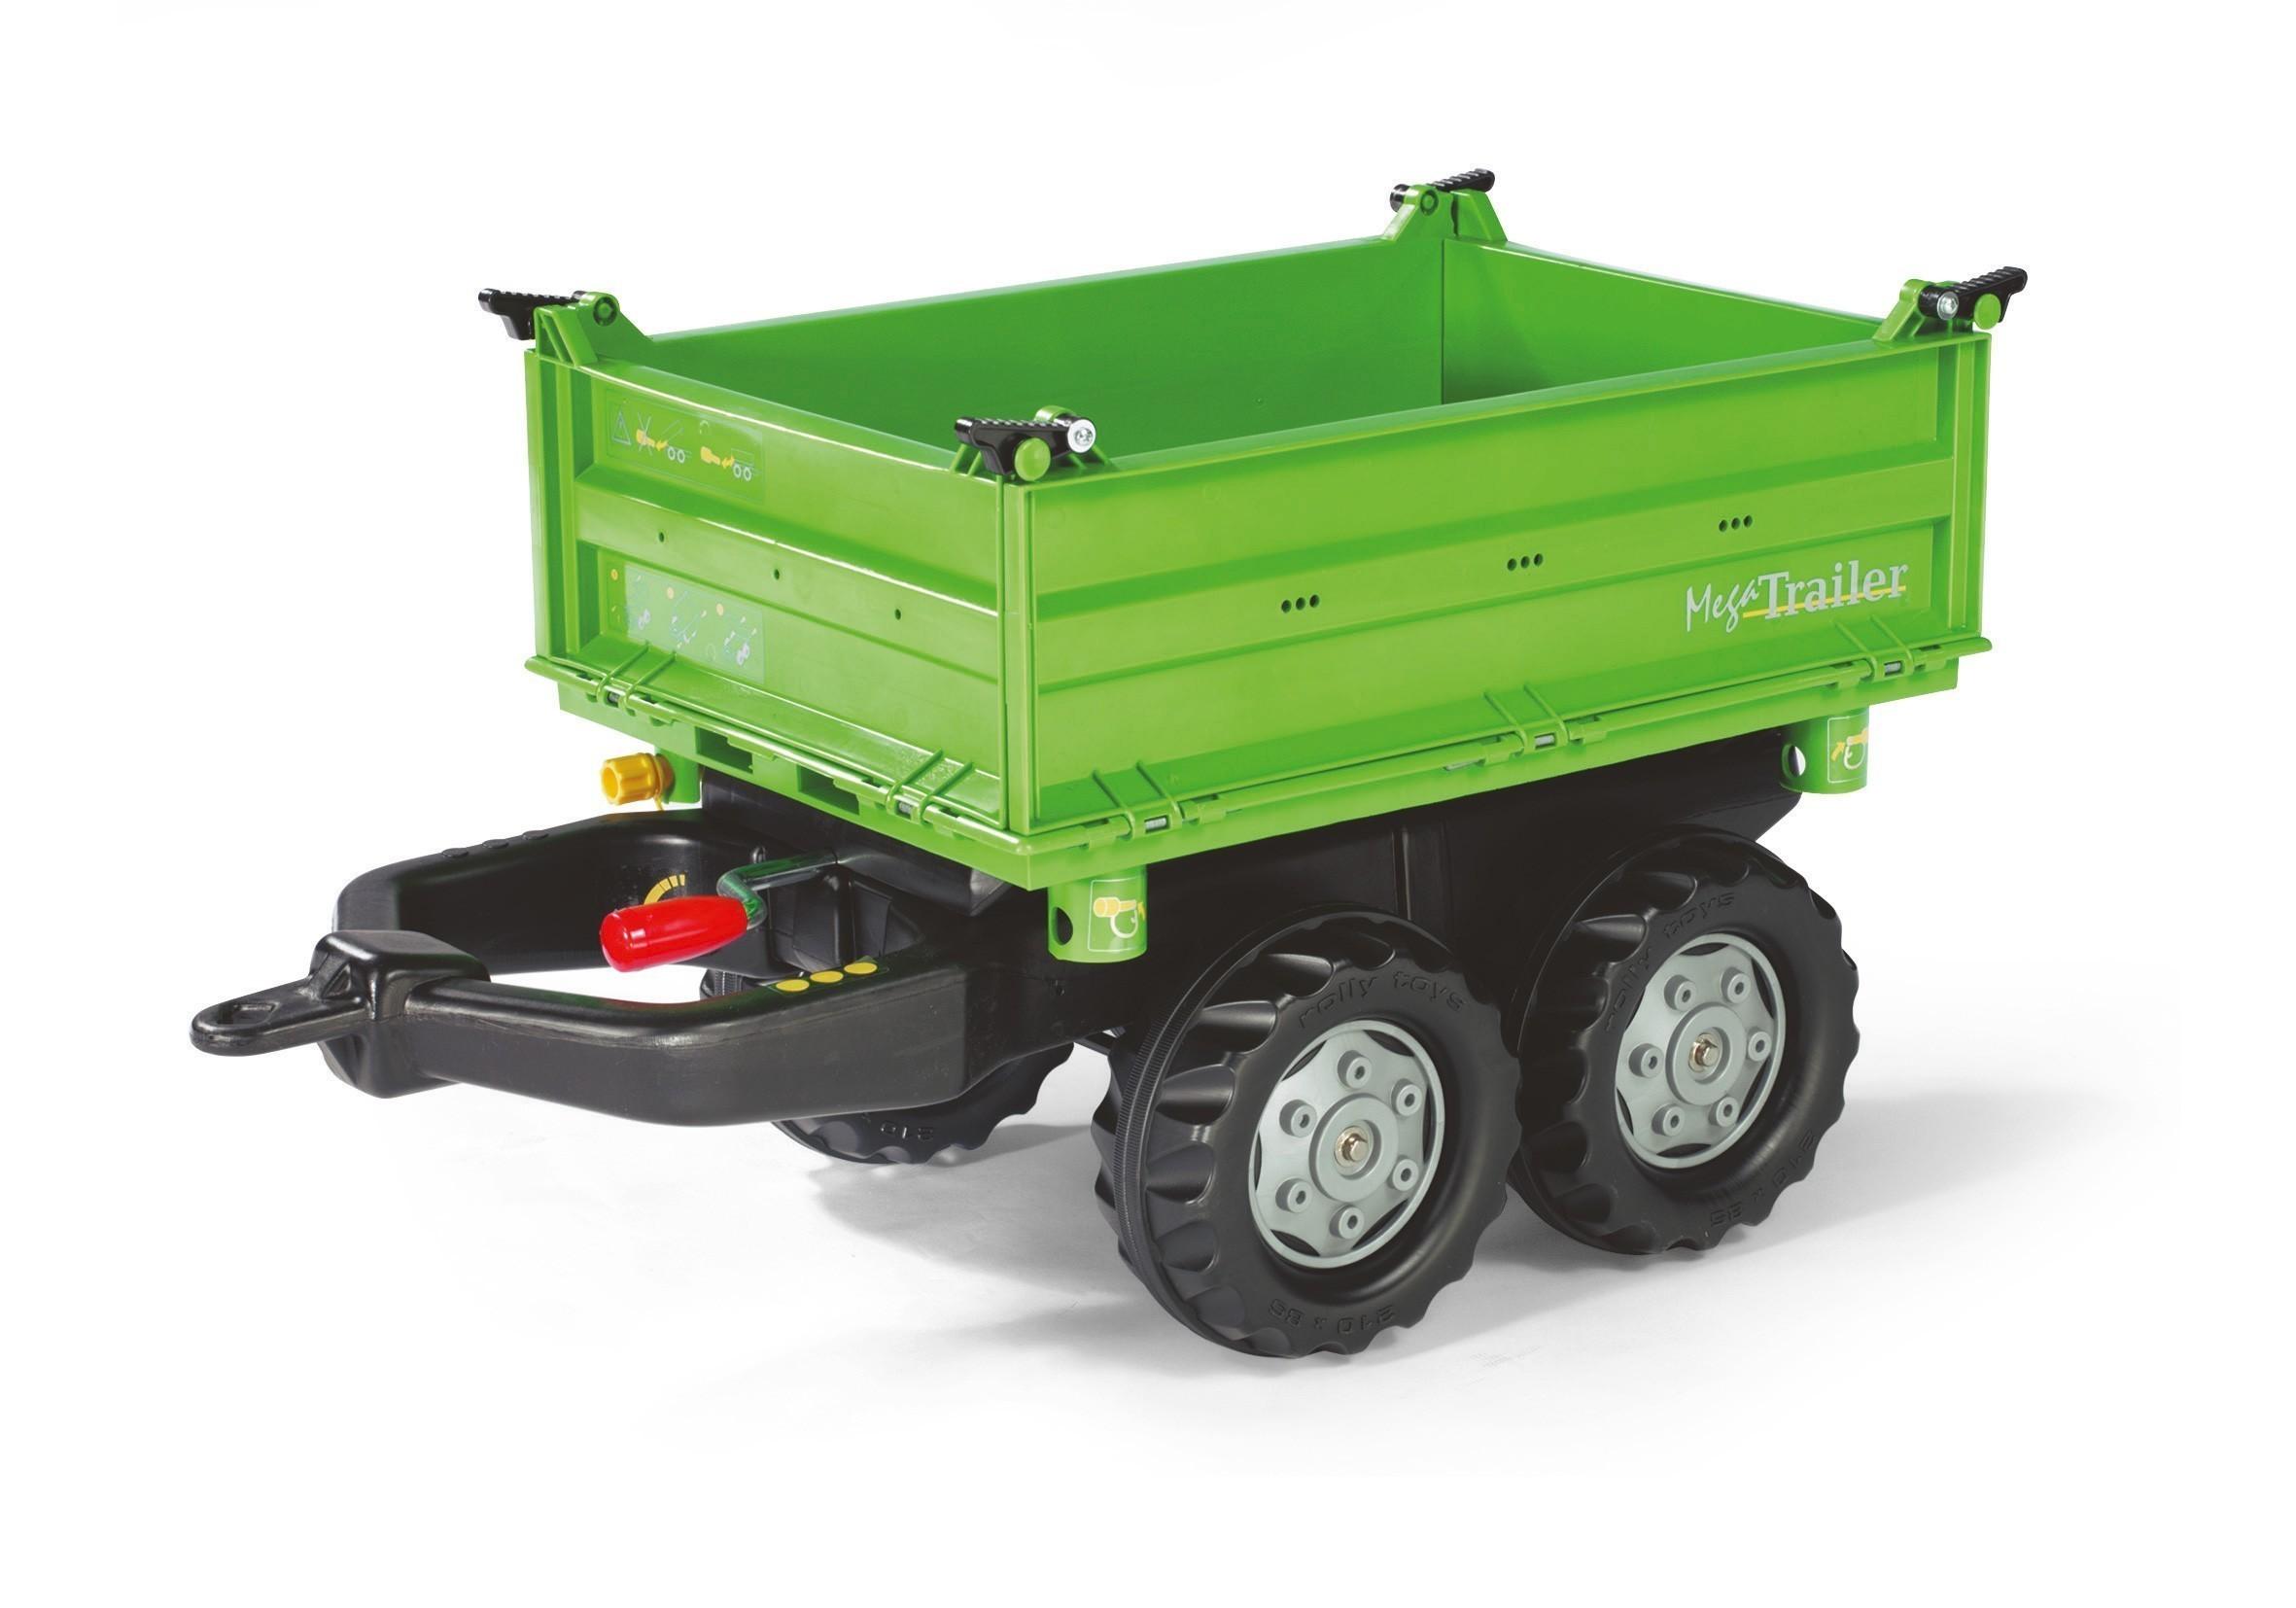 Anhänger für Tretfahrzeug rolly Mega Trailer grün - Rolly Toys Bild 1